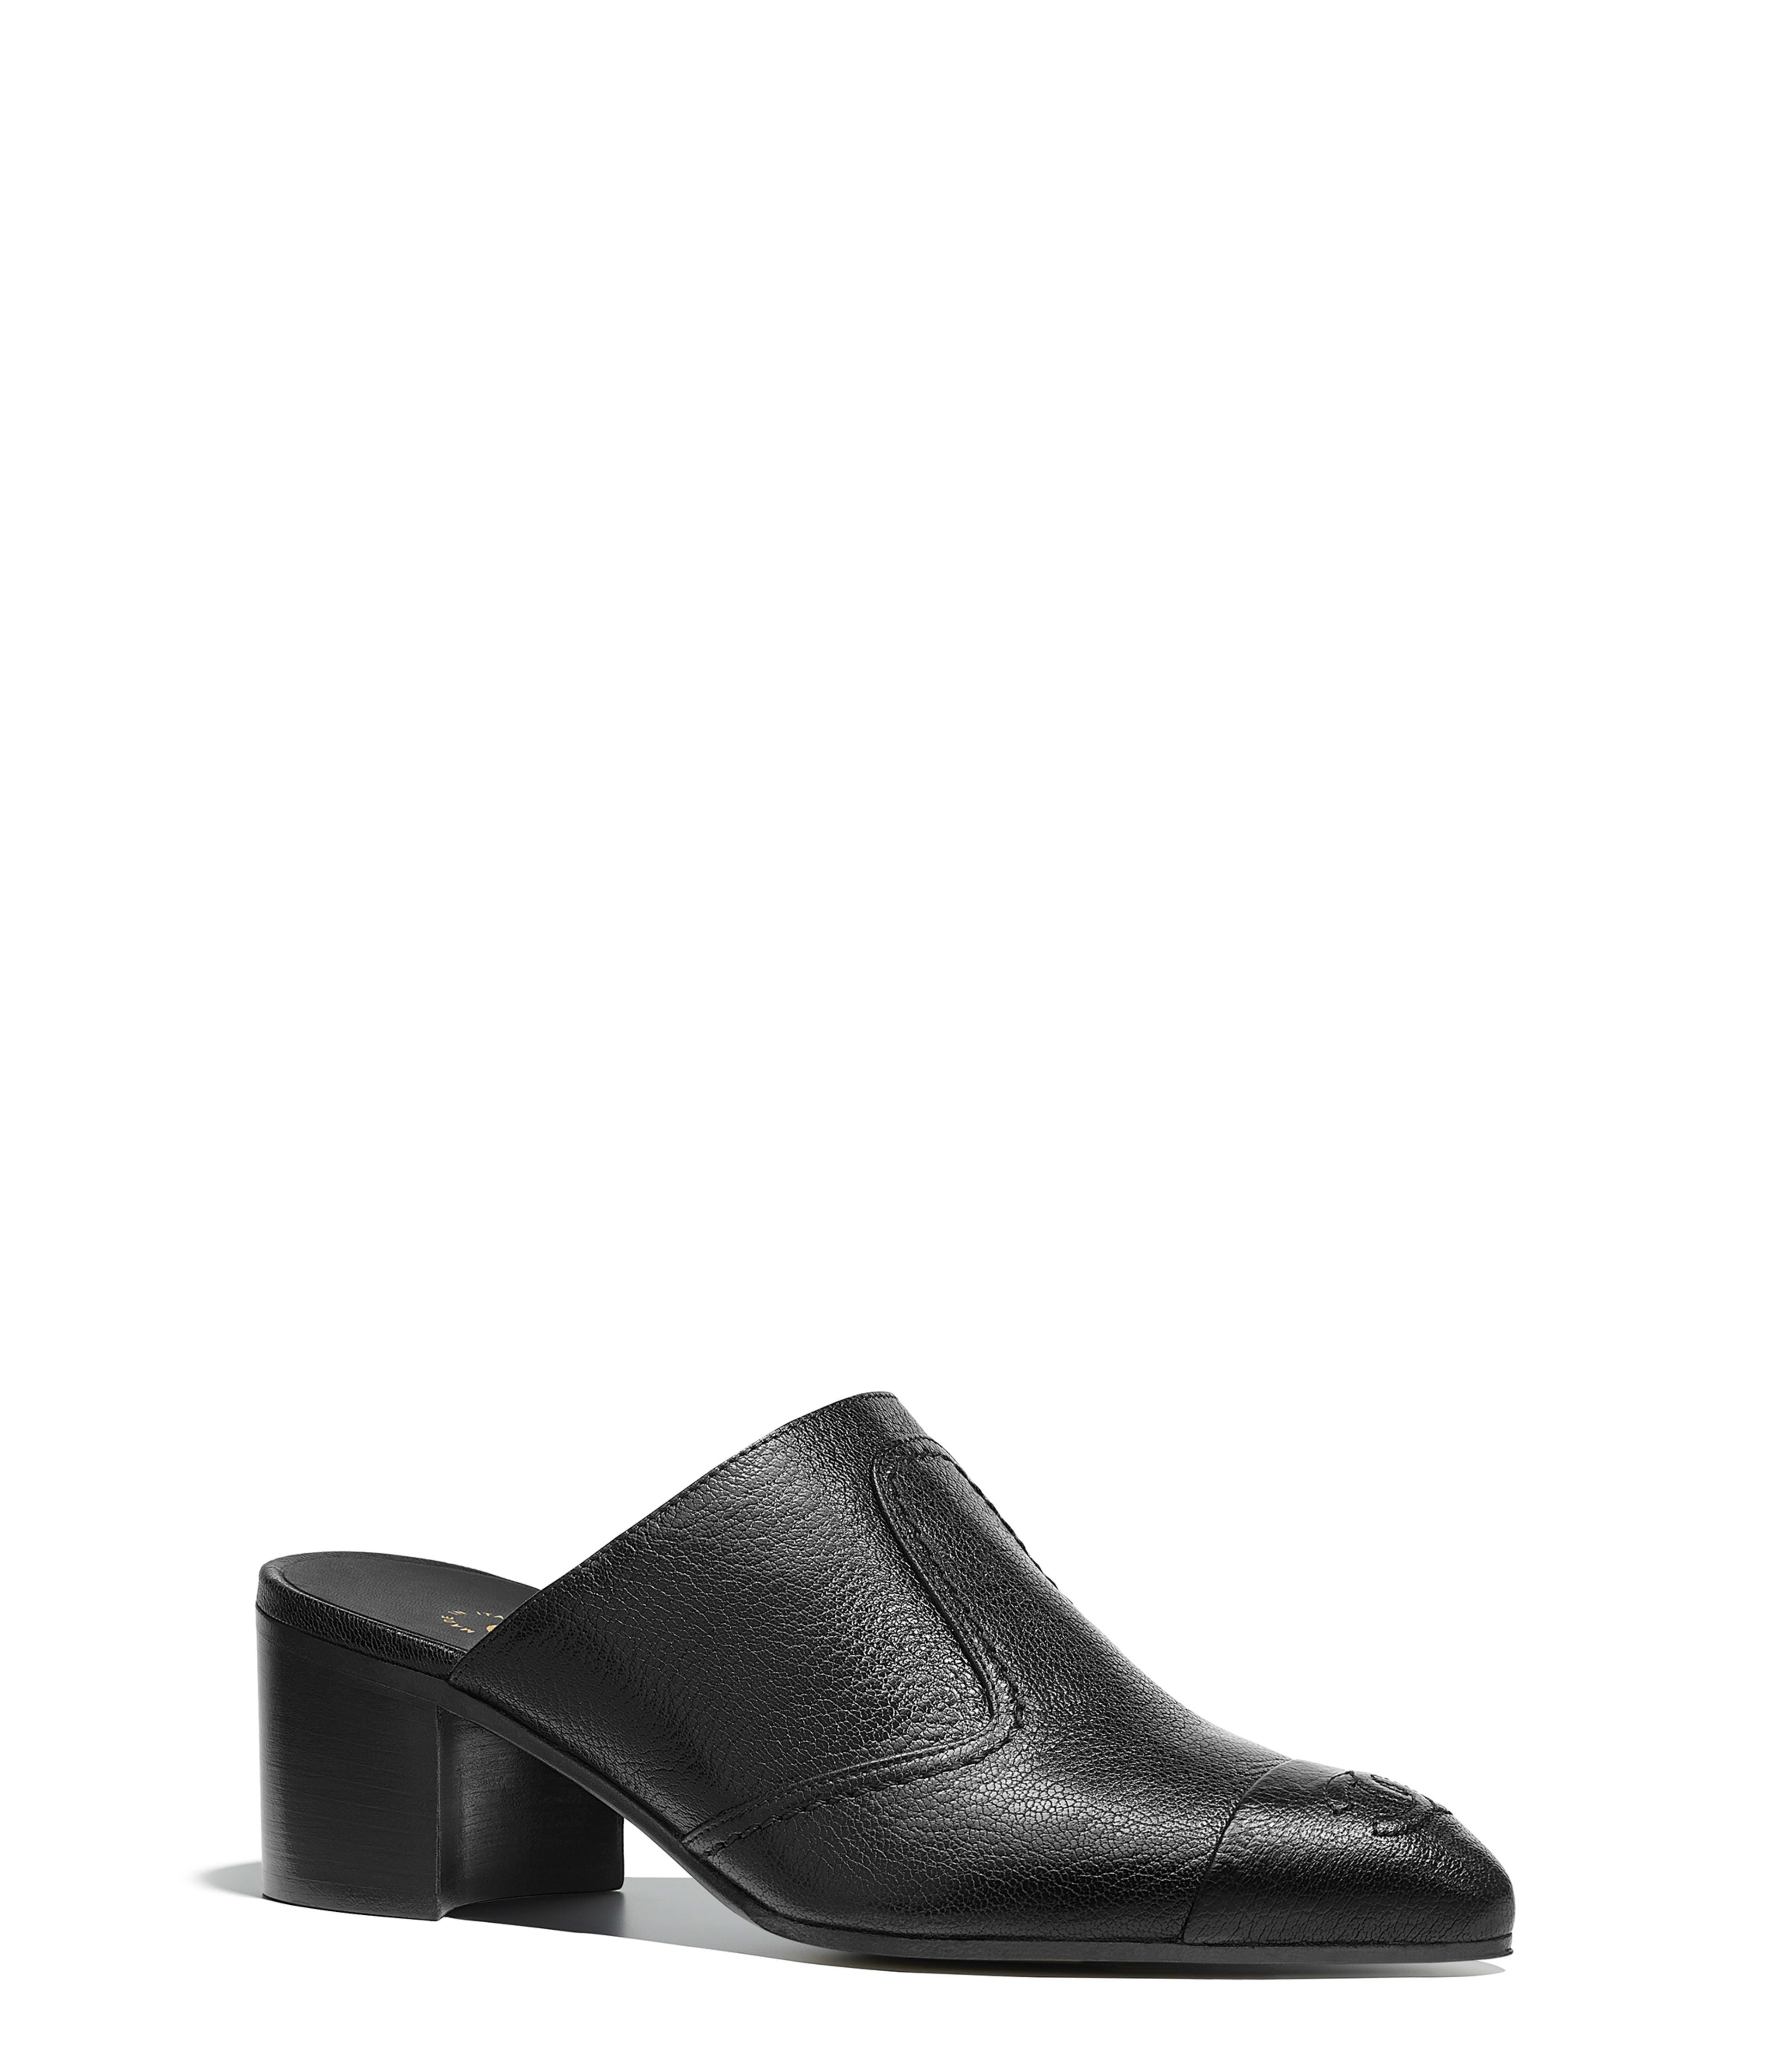 Sandals Shoes Chanel